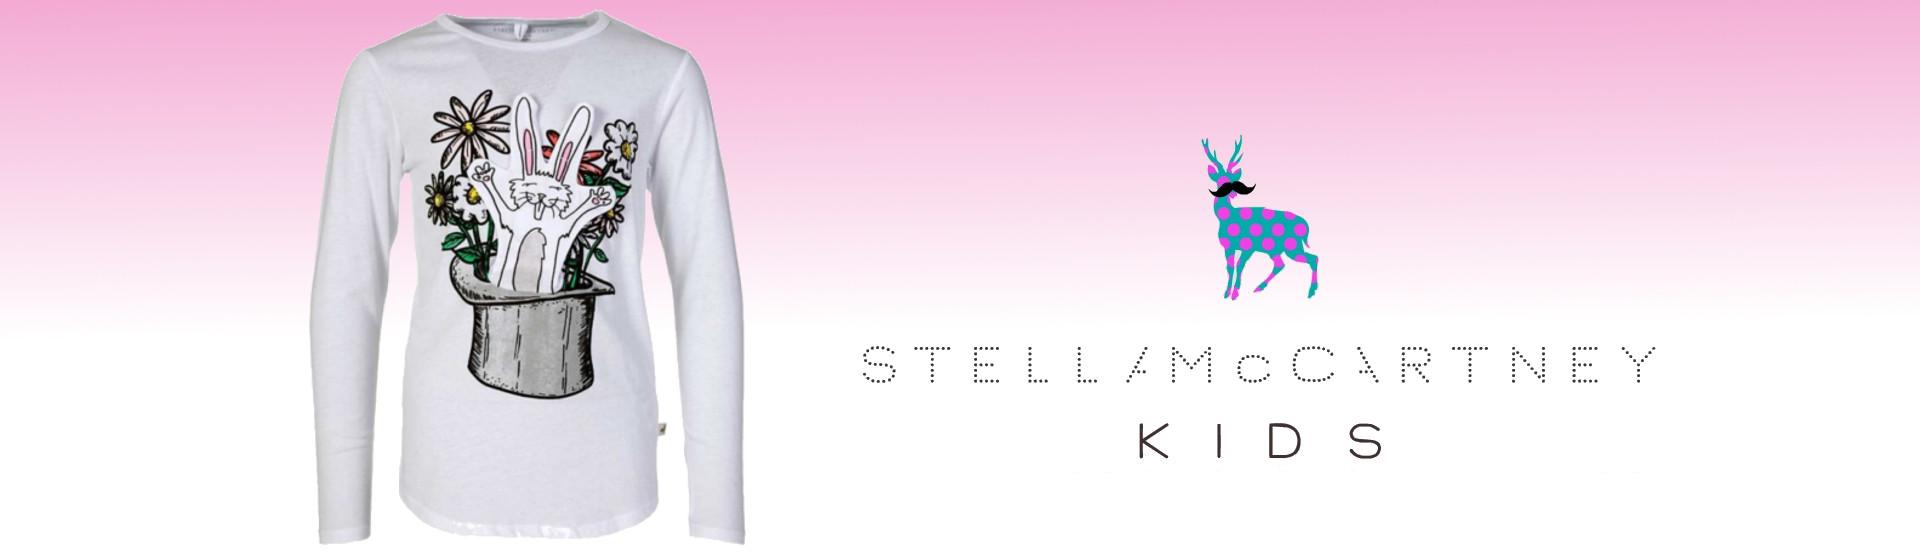 Staff Pick: Abracadabra! Stella's Magical Childrenswear